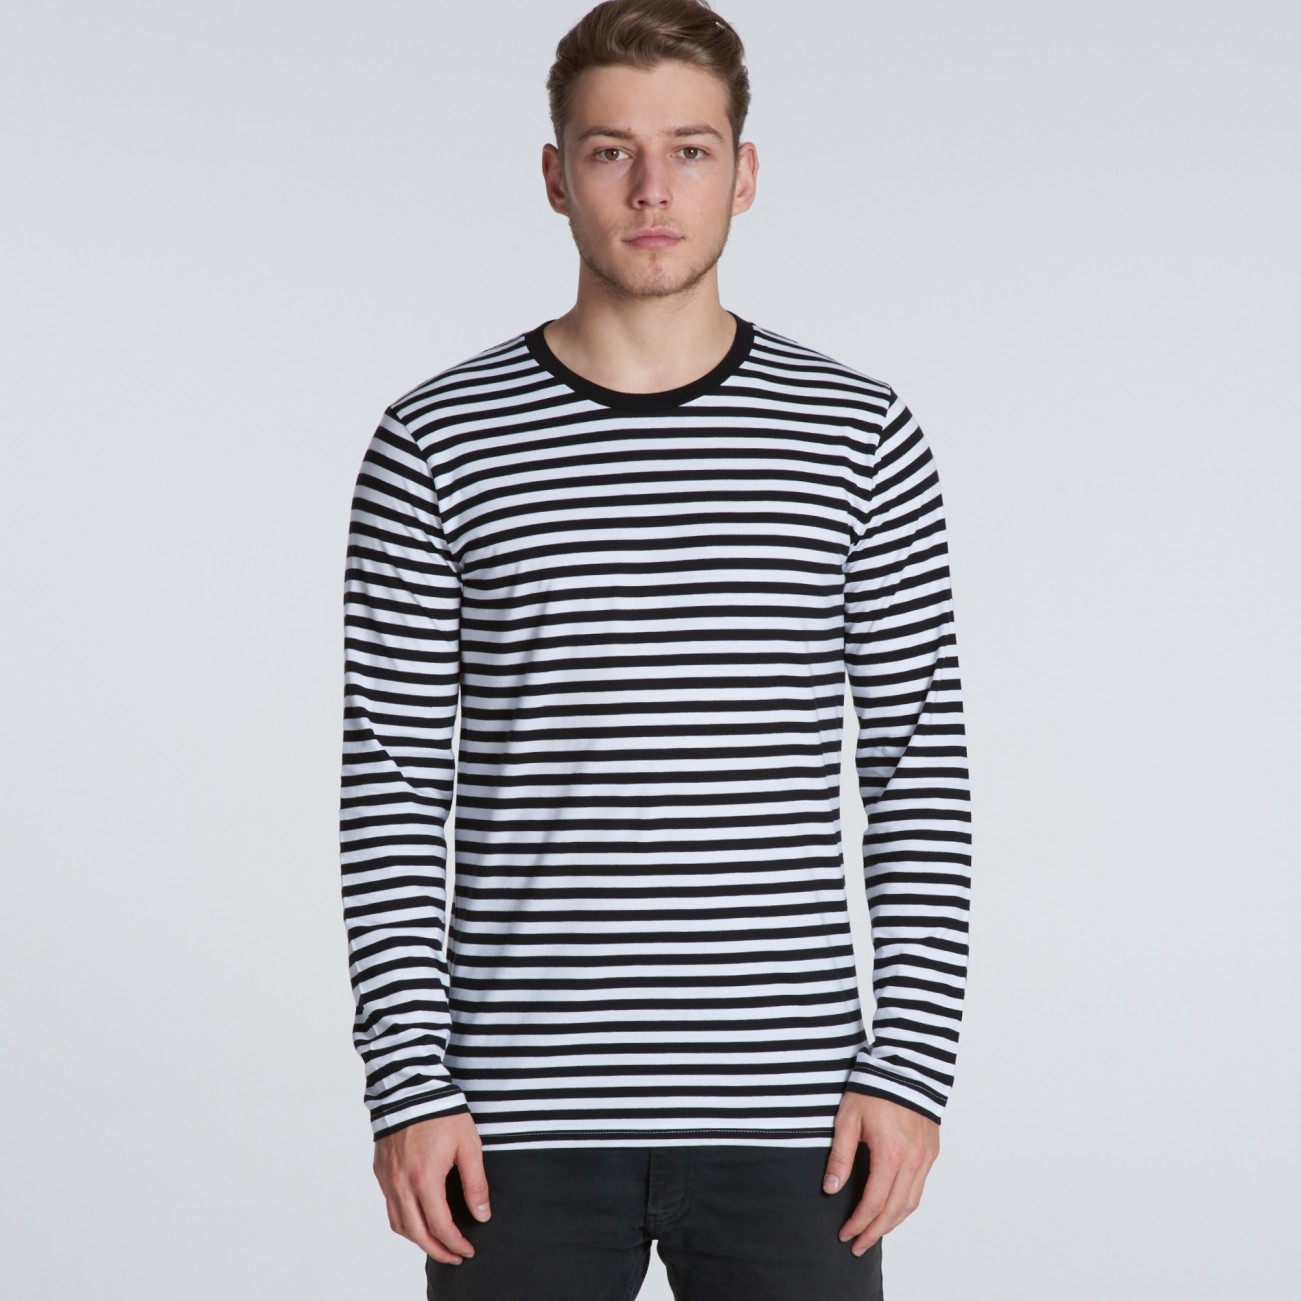 739d8b62ef3 5031 match stripe longsleeve tee front   5031 match stripe longsleeve navy white   5031 match stripe longsleeve grey marle black ...